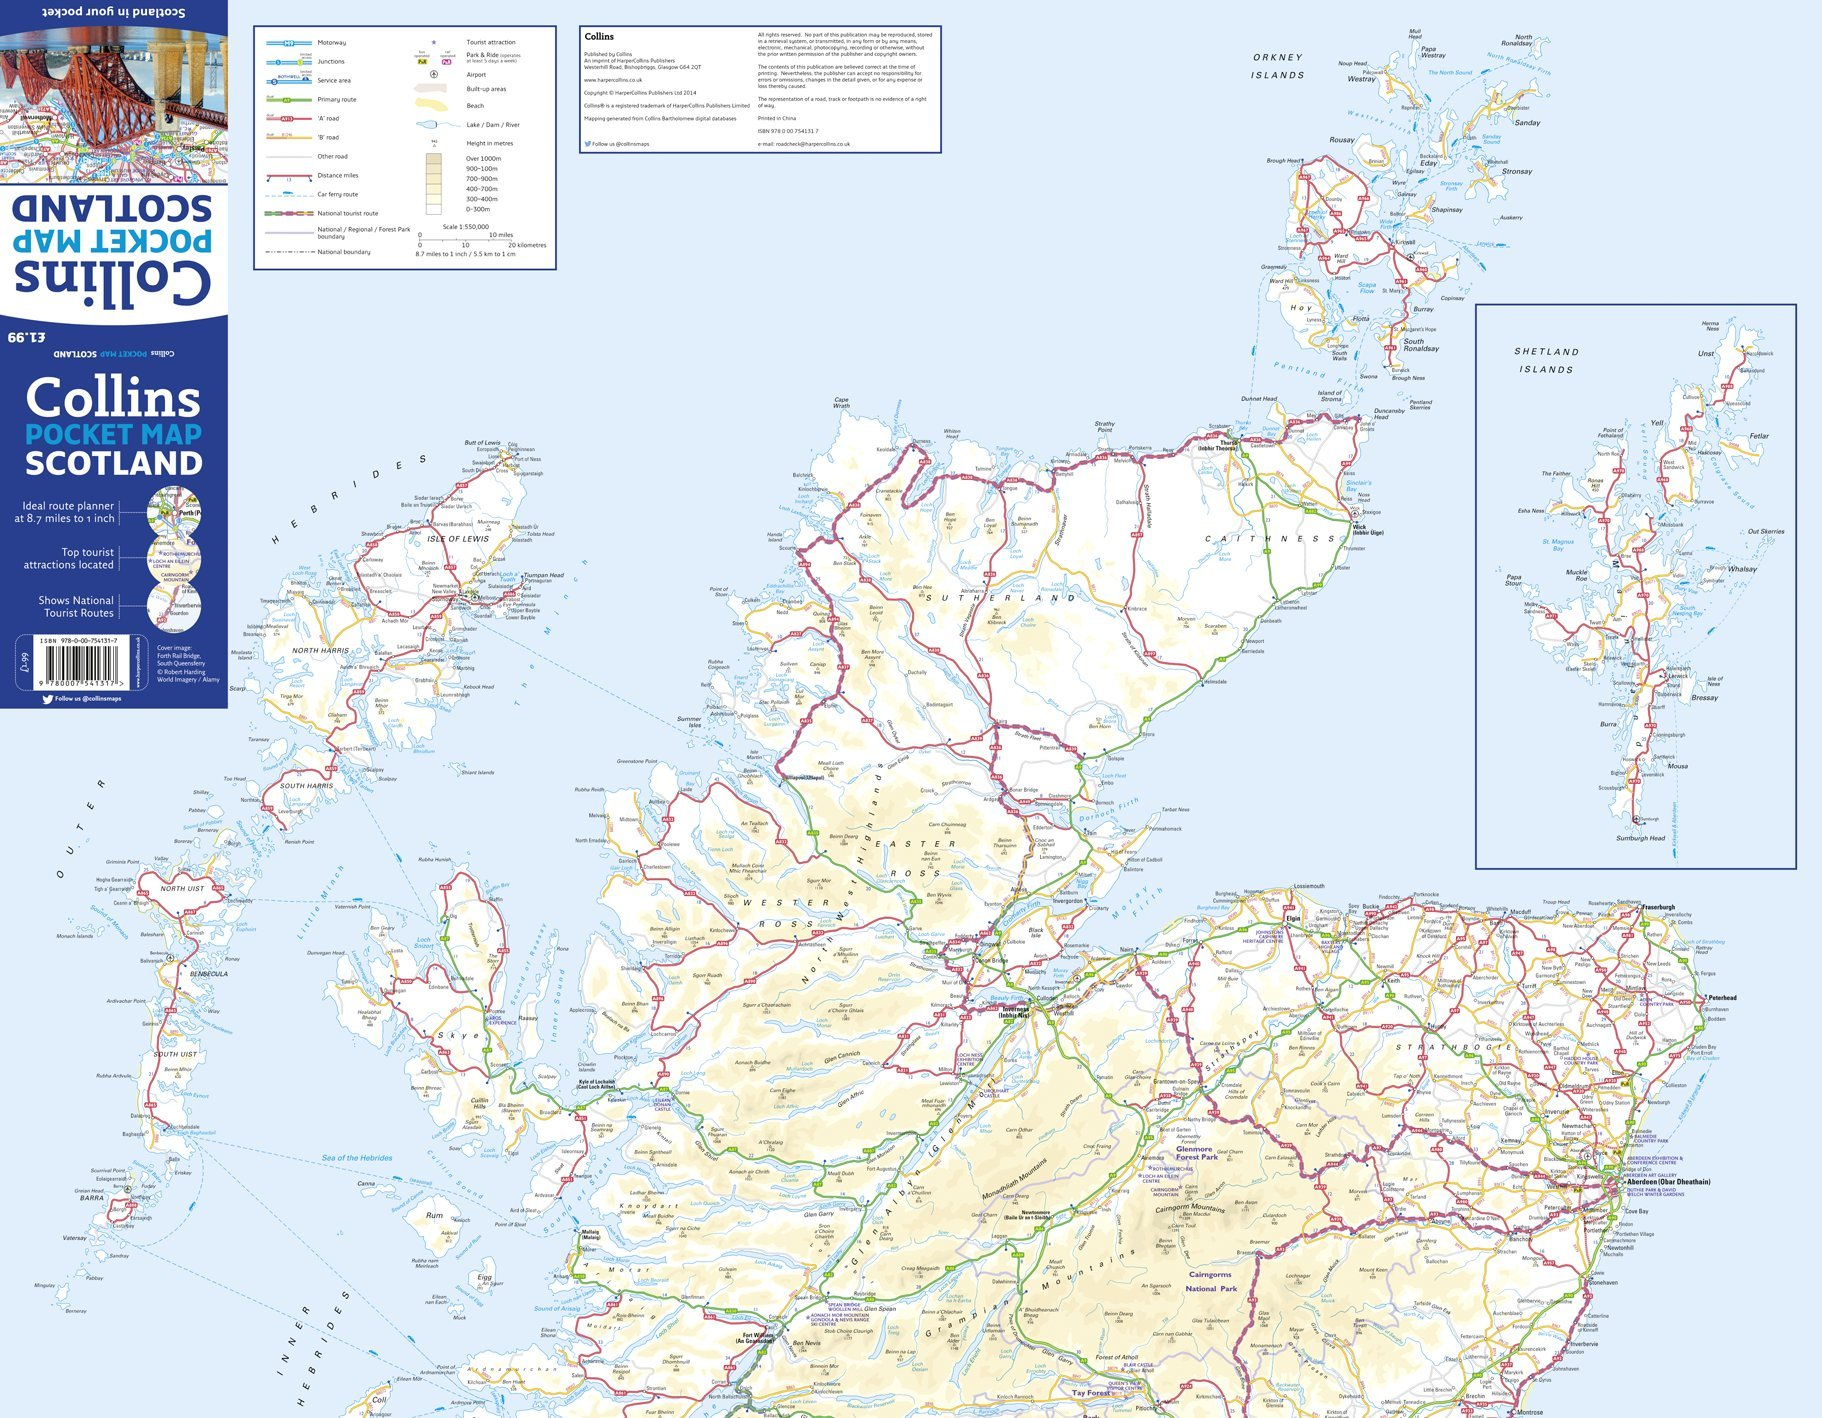 Road Map Of England And Scotland.Scotland Pocket Map Amazon Co Uk Collins Maps 9780007541317 Books